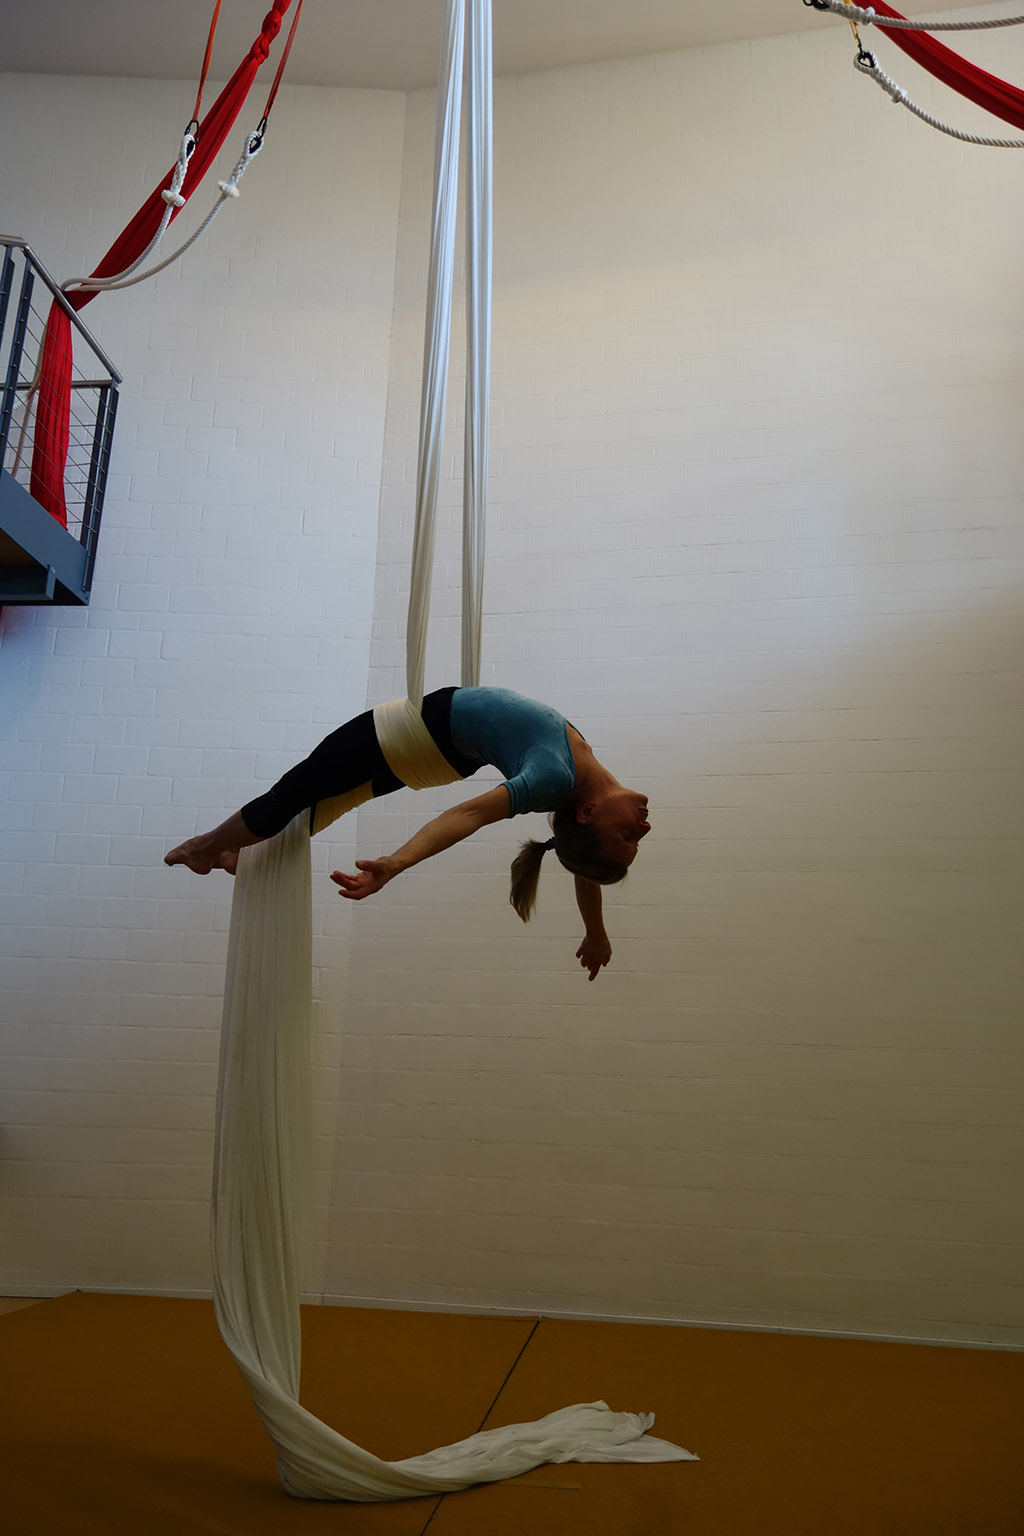 Luftakrobatik Vertikaltuch Trapez Aerial Hoop Loft am Bach Dietlikon Zuerich (6)